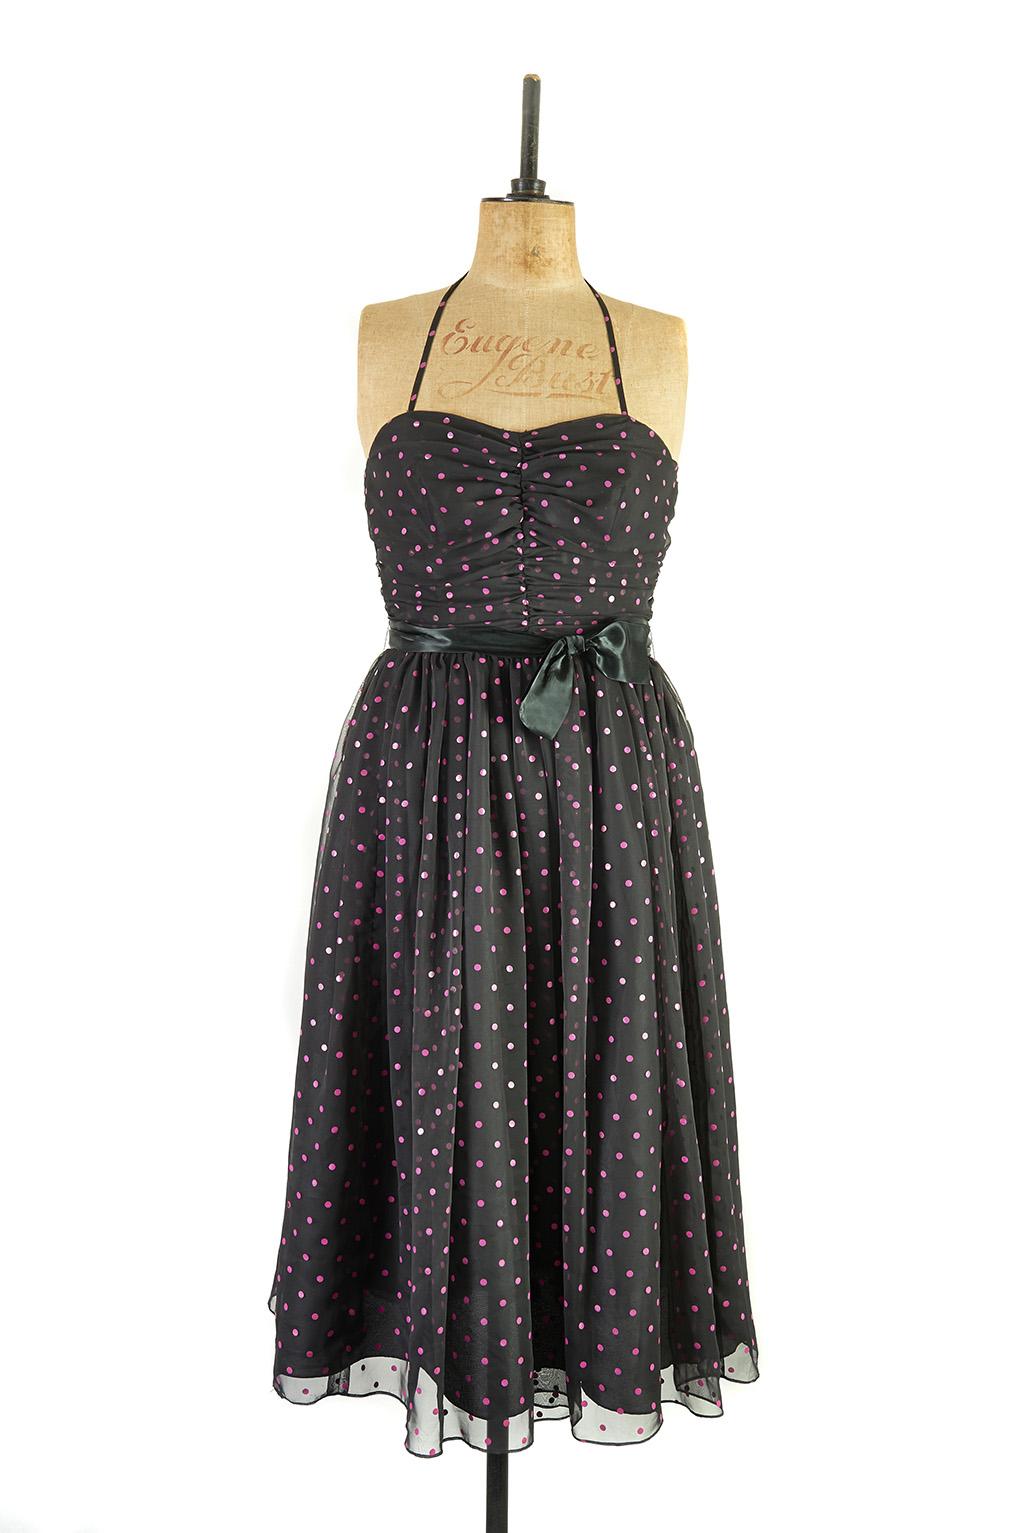 Polka Dot Party Dress by Radley of London